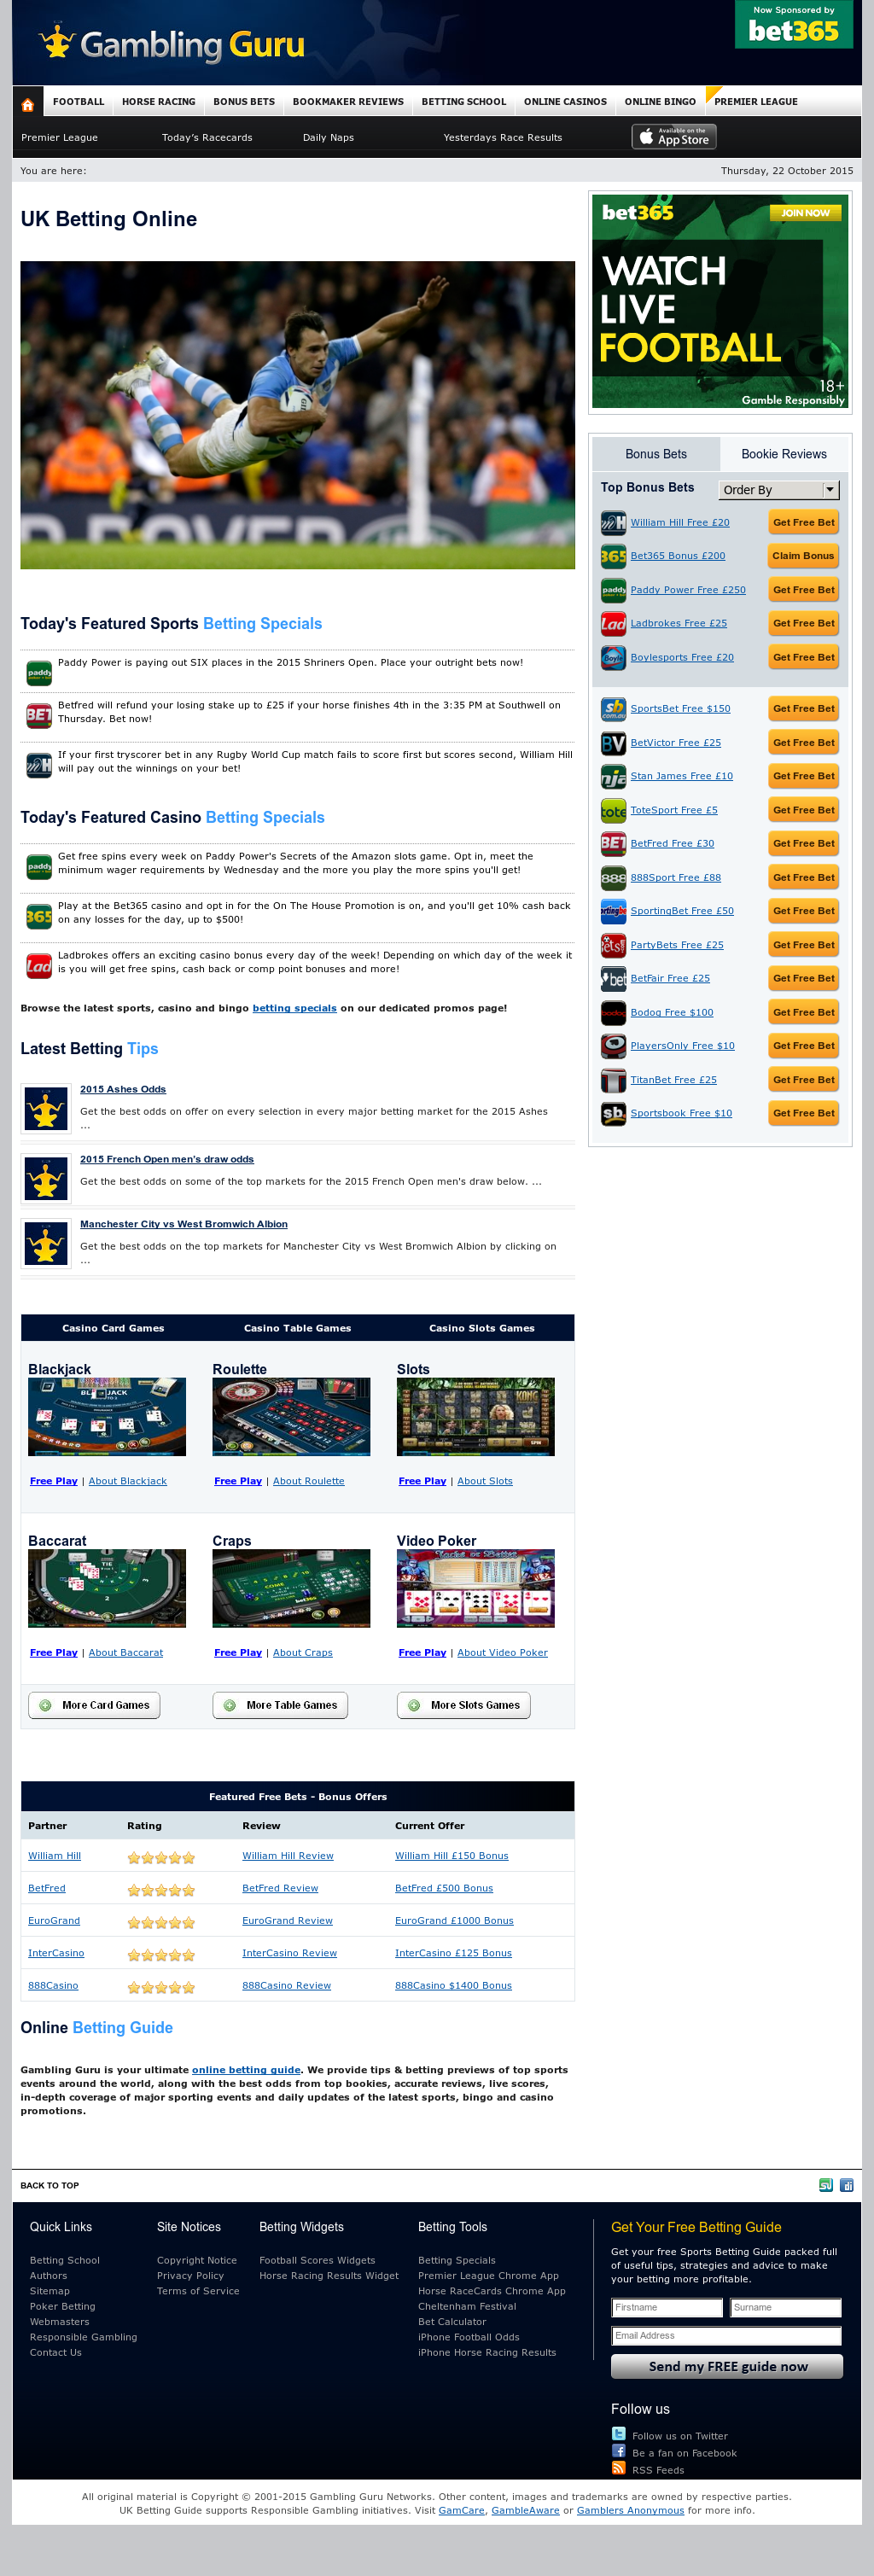 Gambling guru networks mecca online free slot games